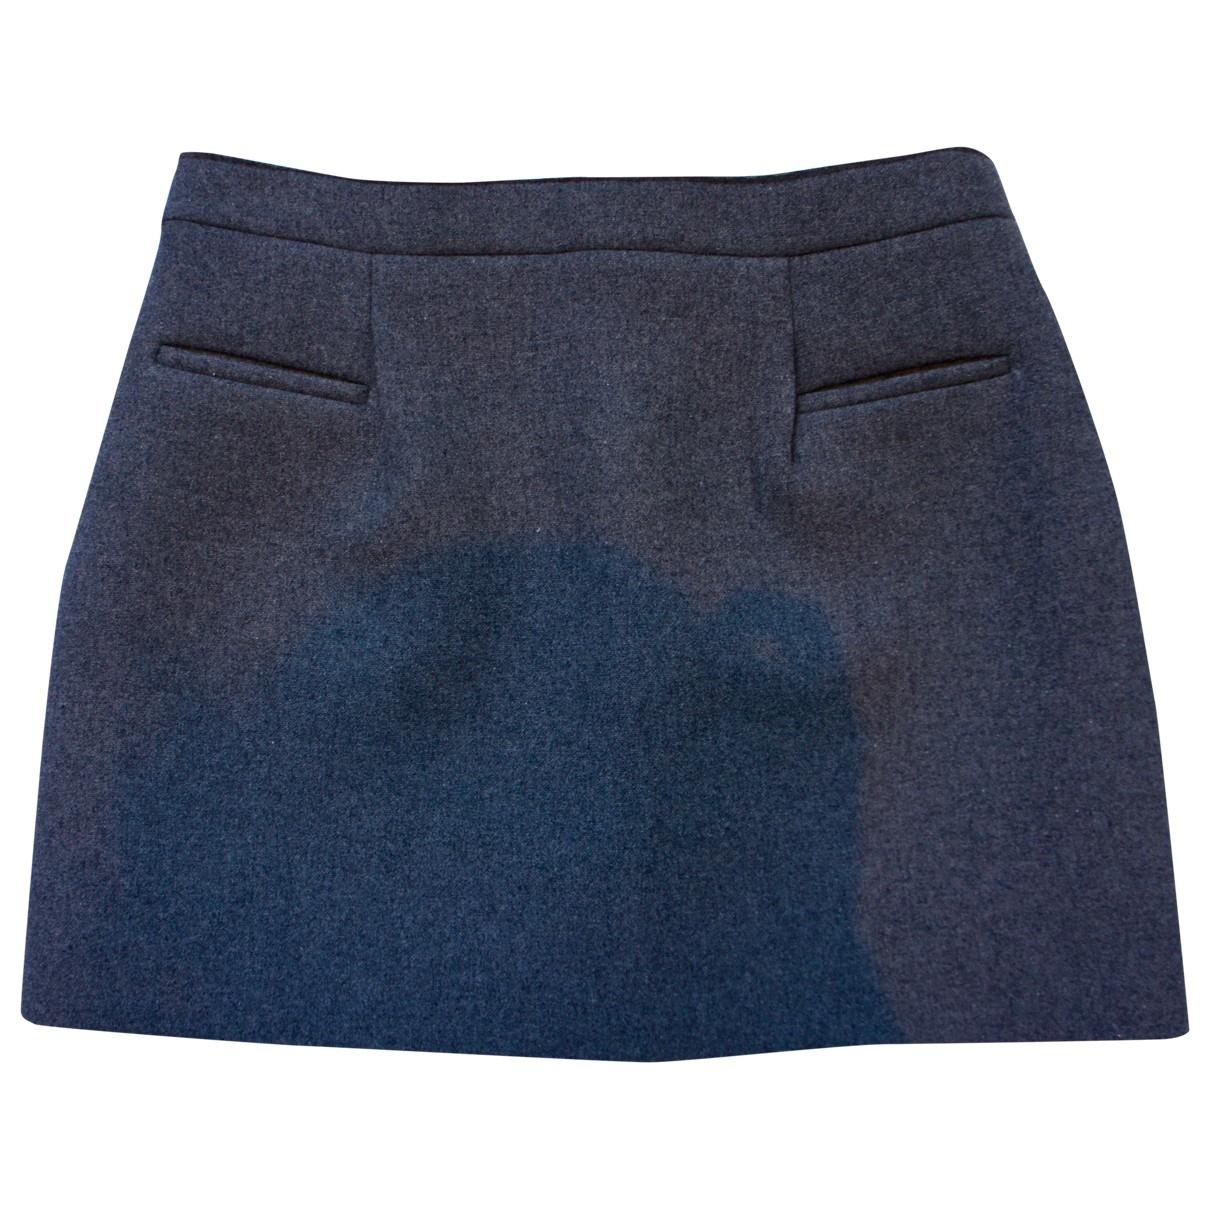 J.w. Anderson \N Grey Wool skirt for Women 10 UK